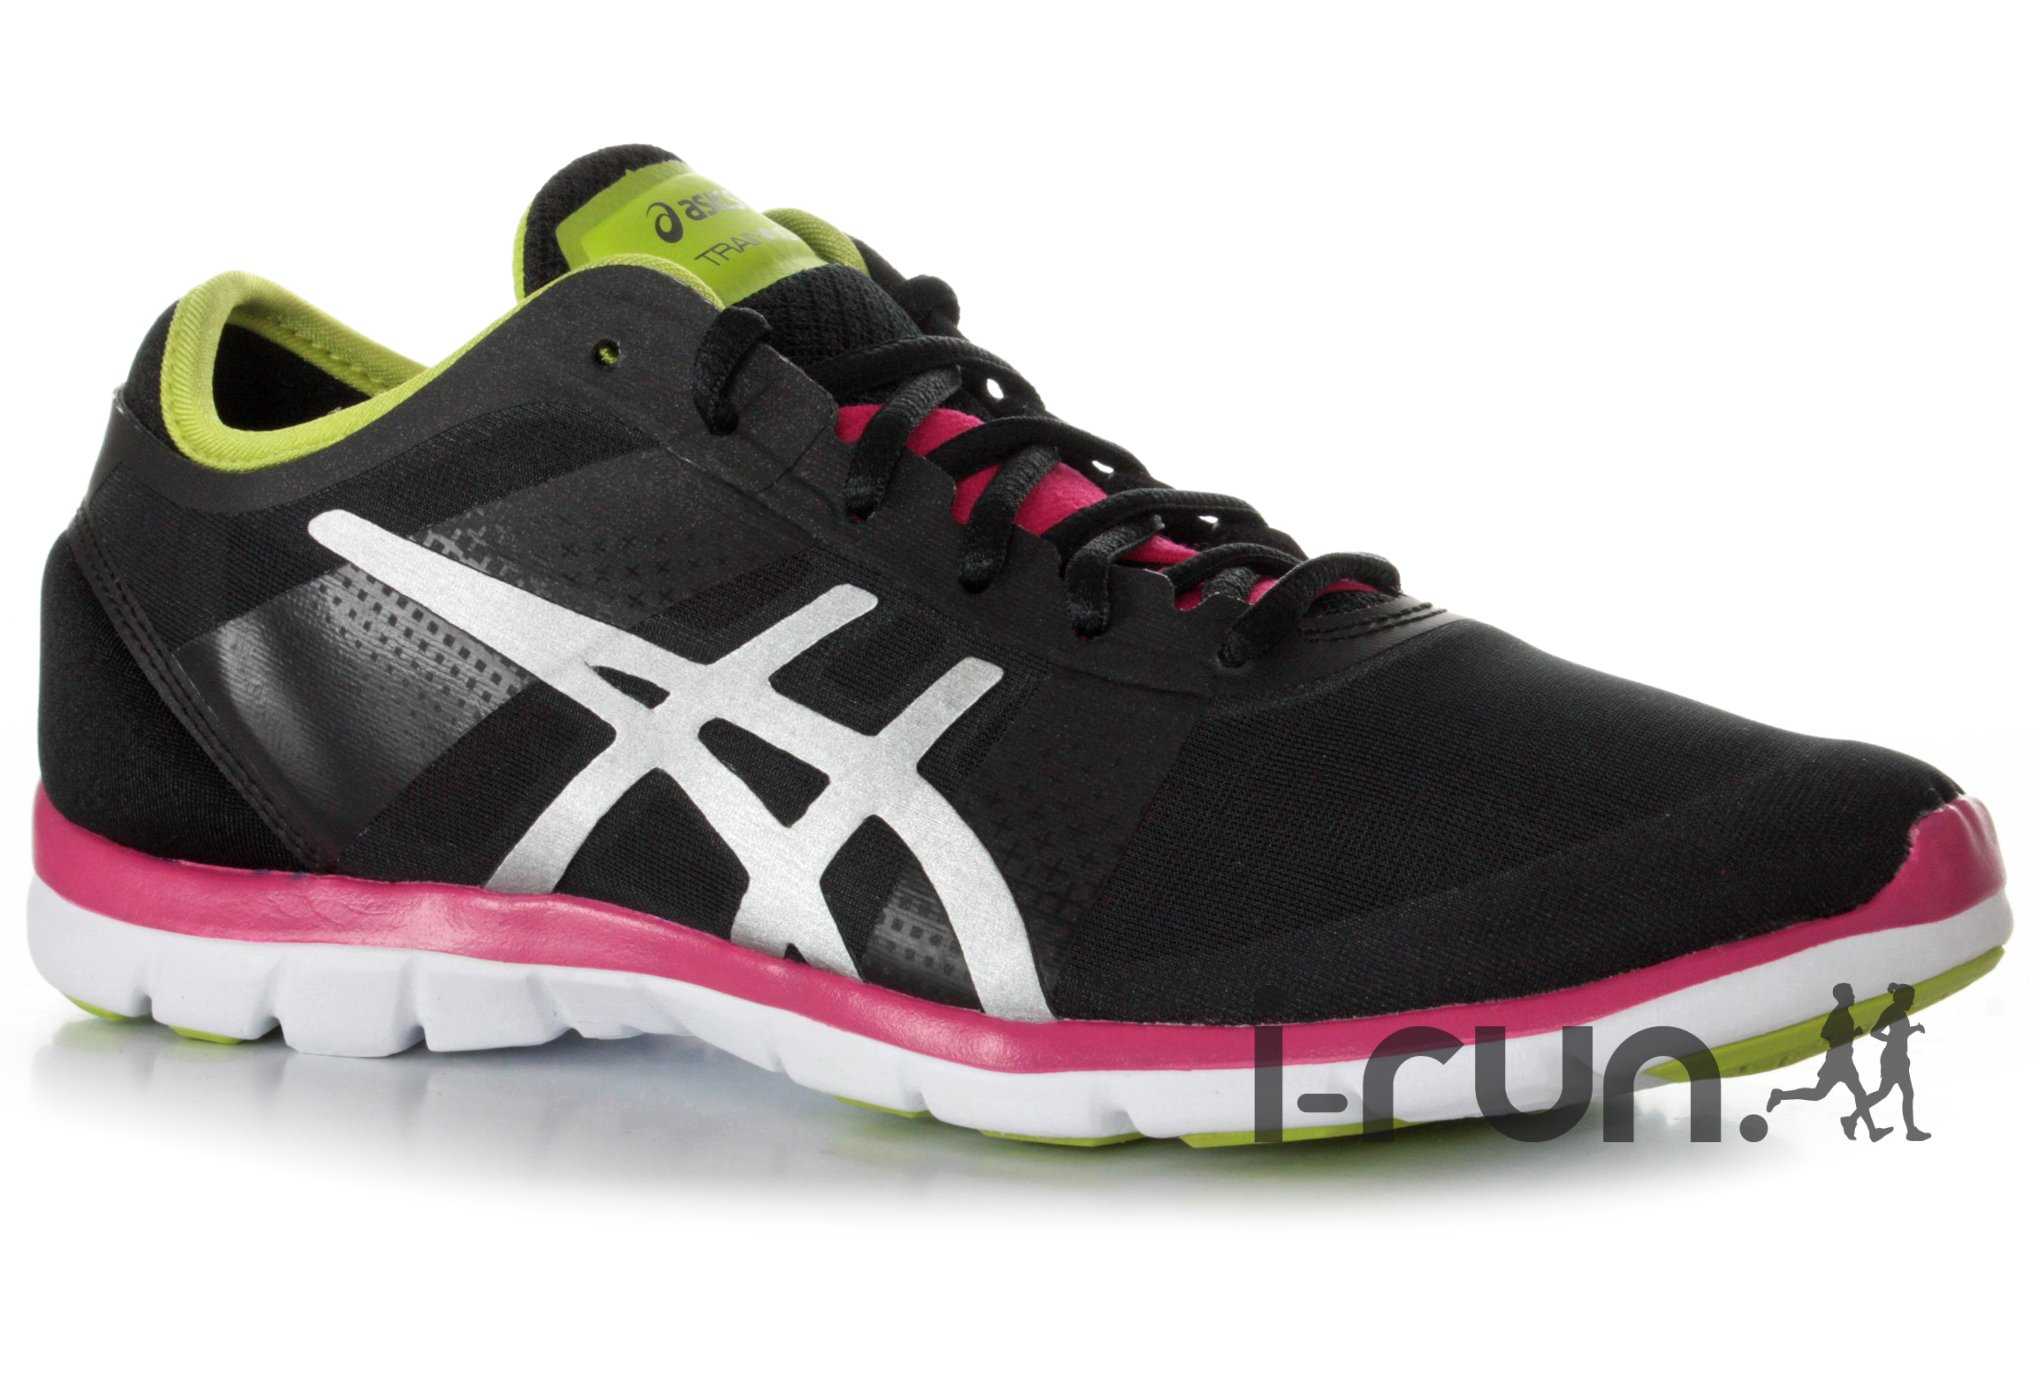 chaussures running femme asics soldes